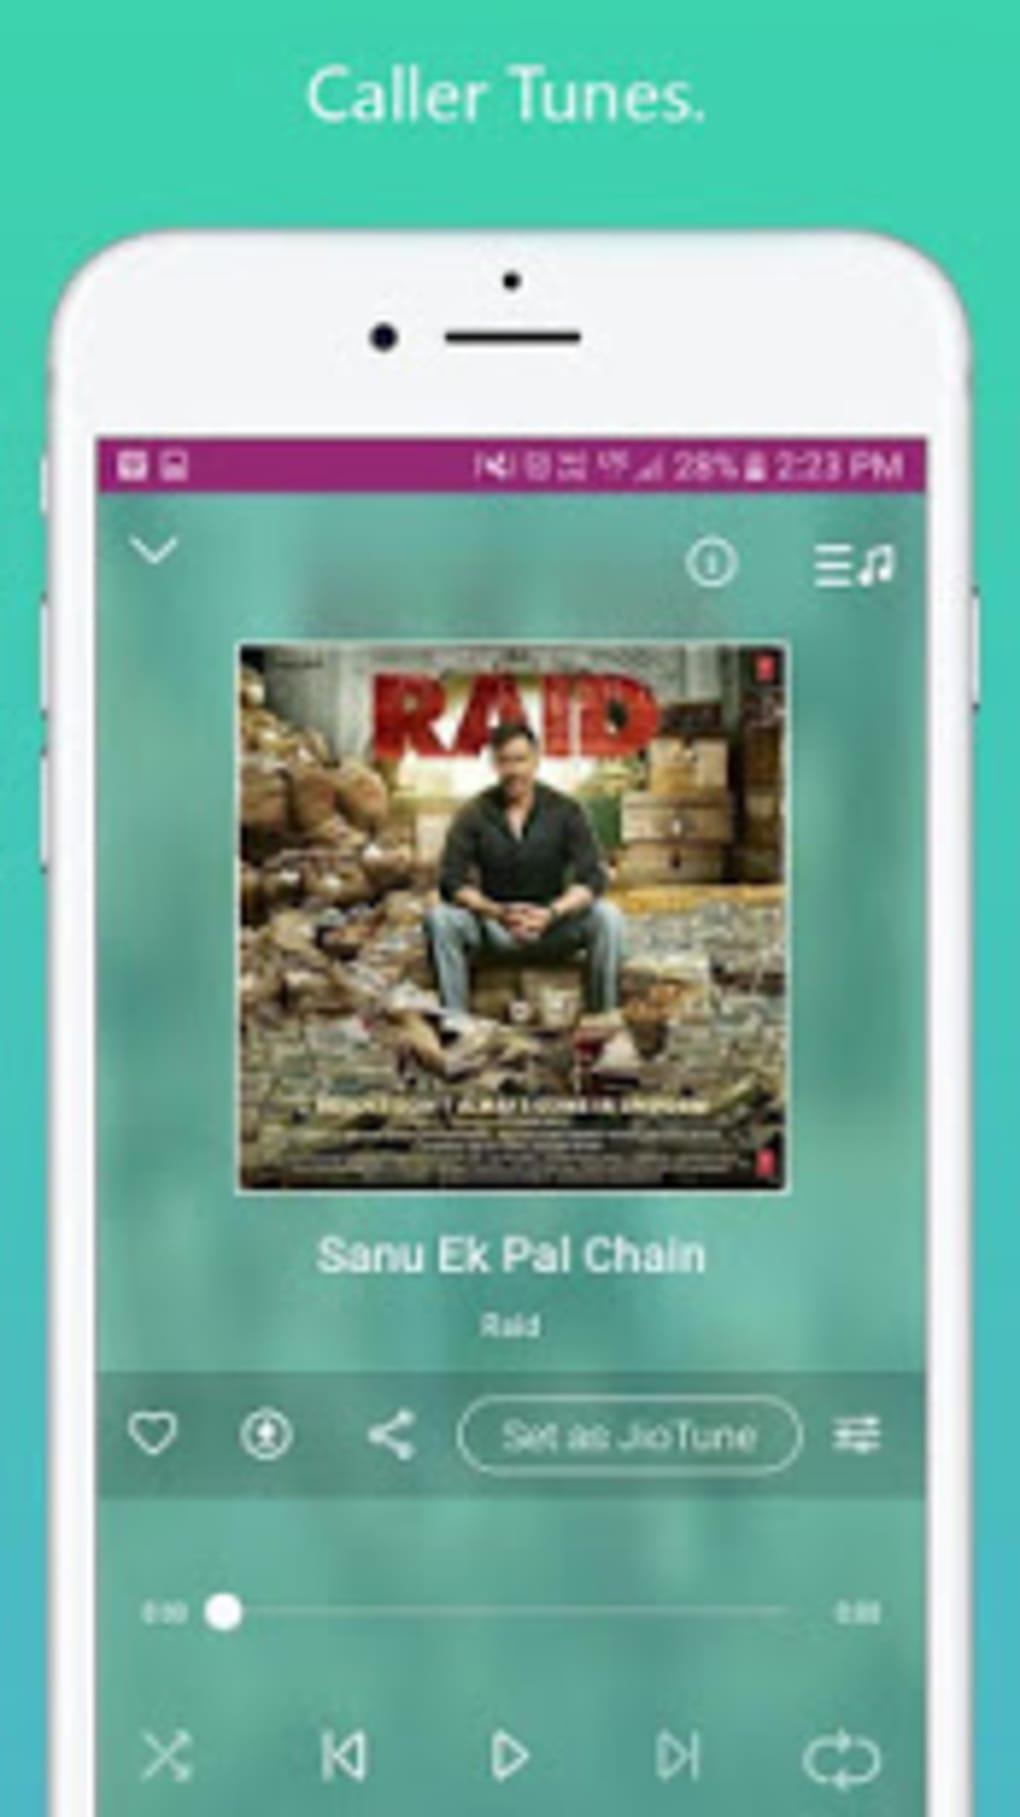 Jio Music Apk Old Version Download